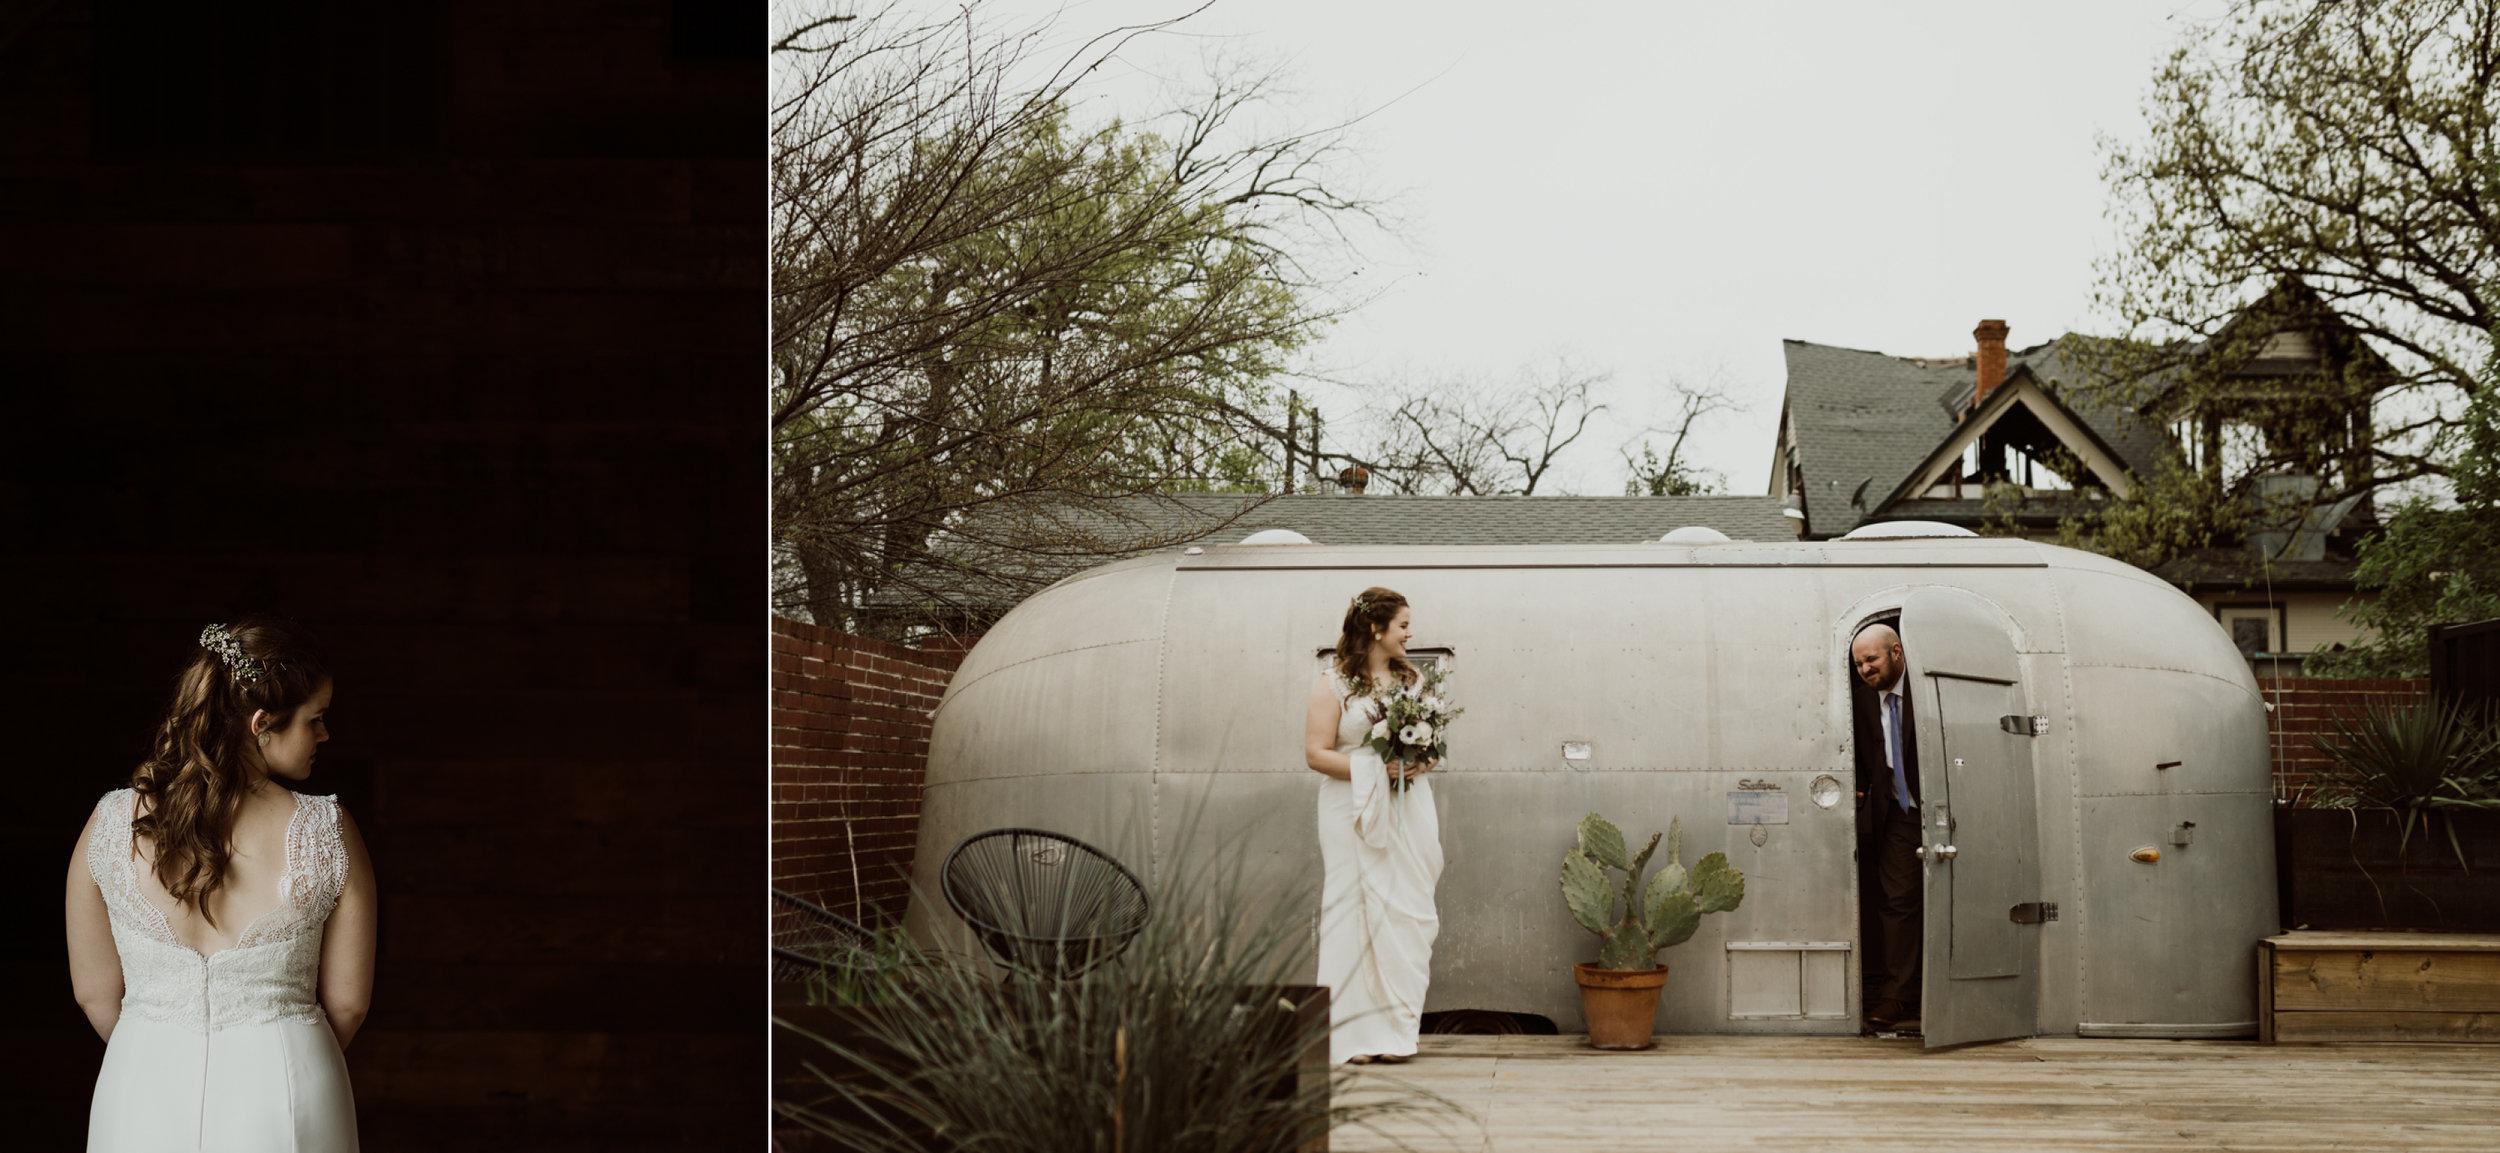 17-3-adventure-wedding-photographer-15.jpg